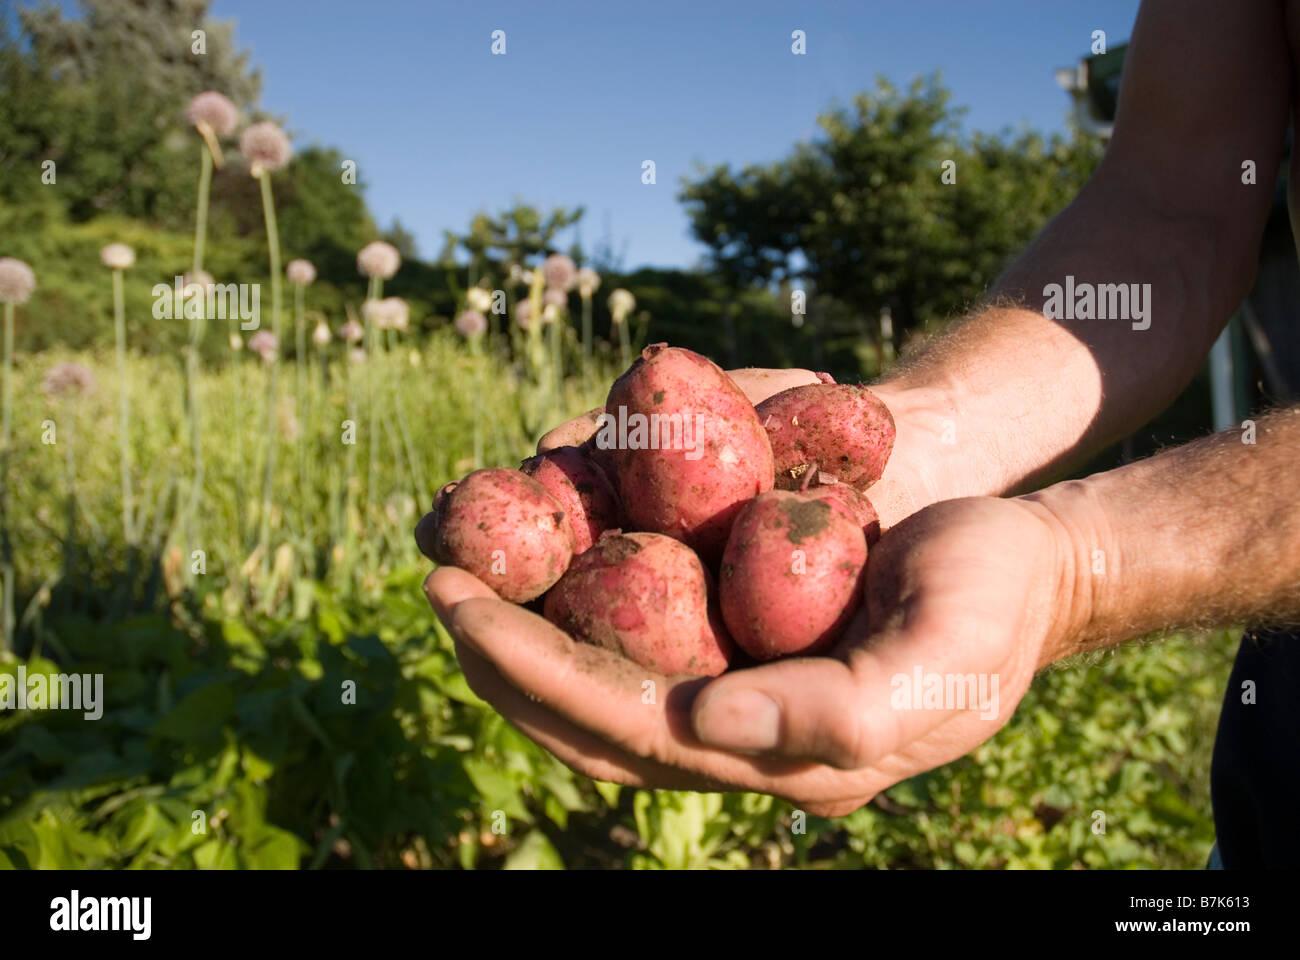 Hands holding fresh locally grown potatoes, Okanogan Centre, BC Canada - Stock Image